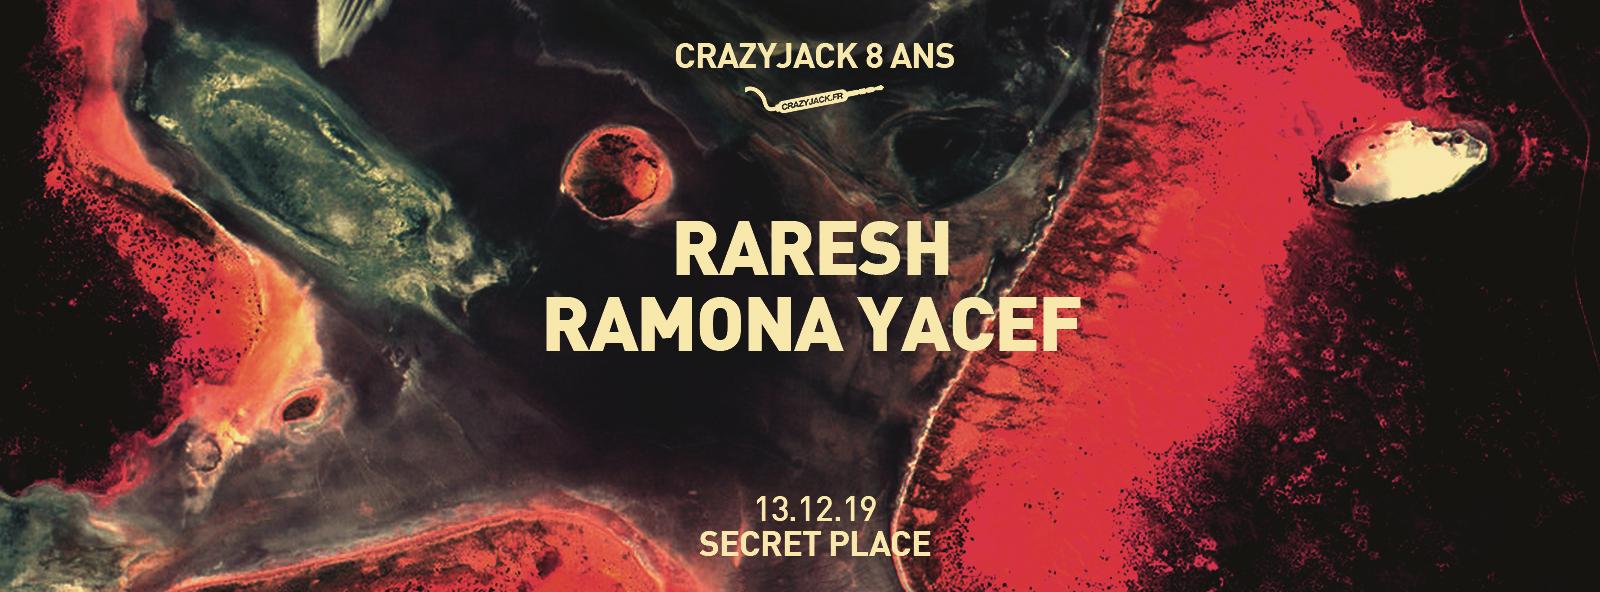 CrazyJack 8 ans : Raresh, Ramona Yacef